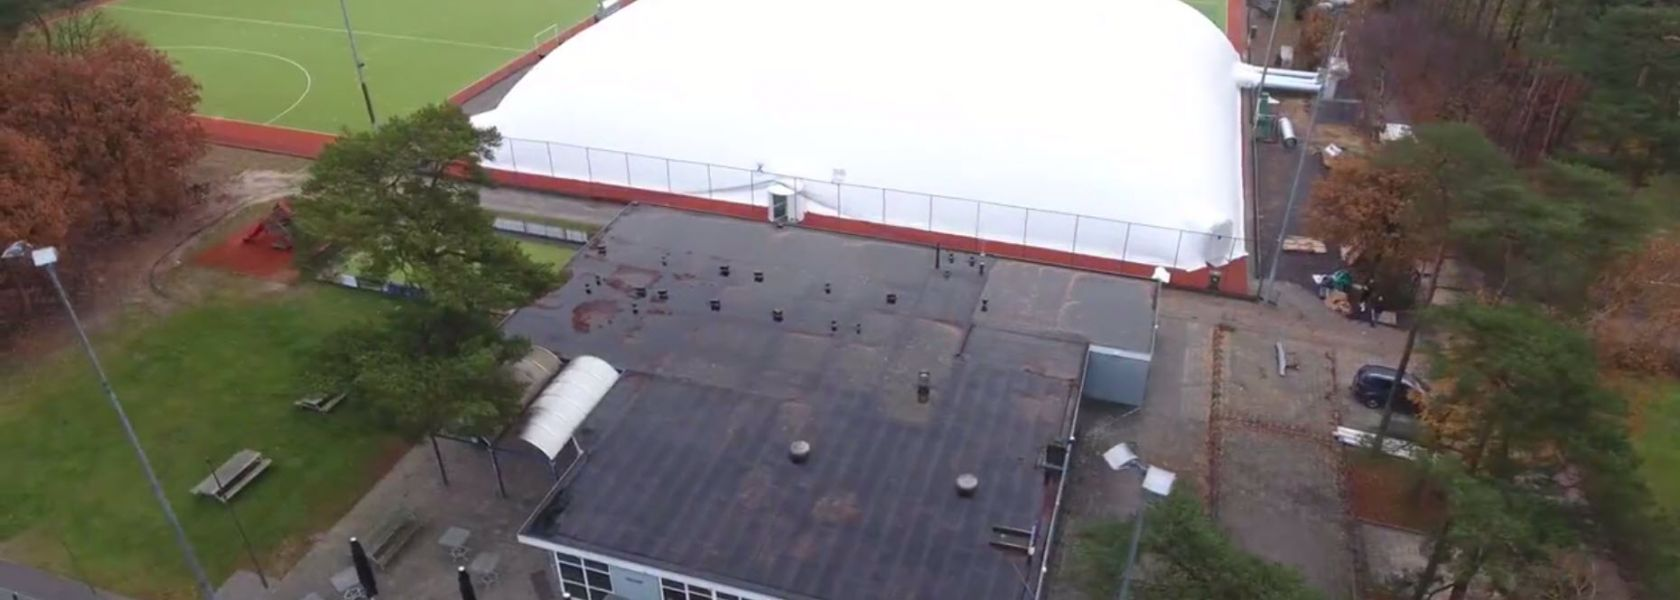 Hockey Club HOD